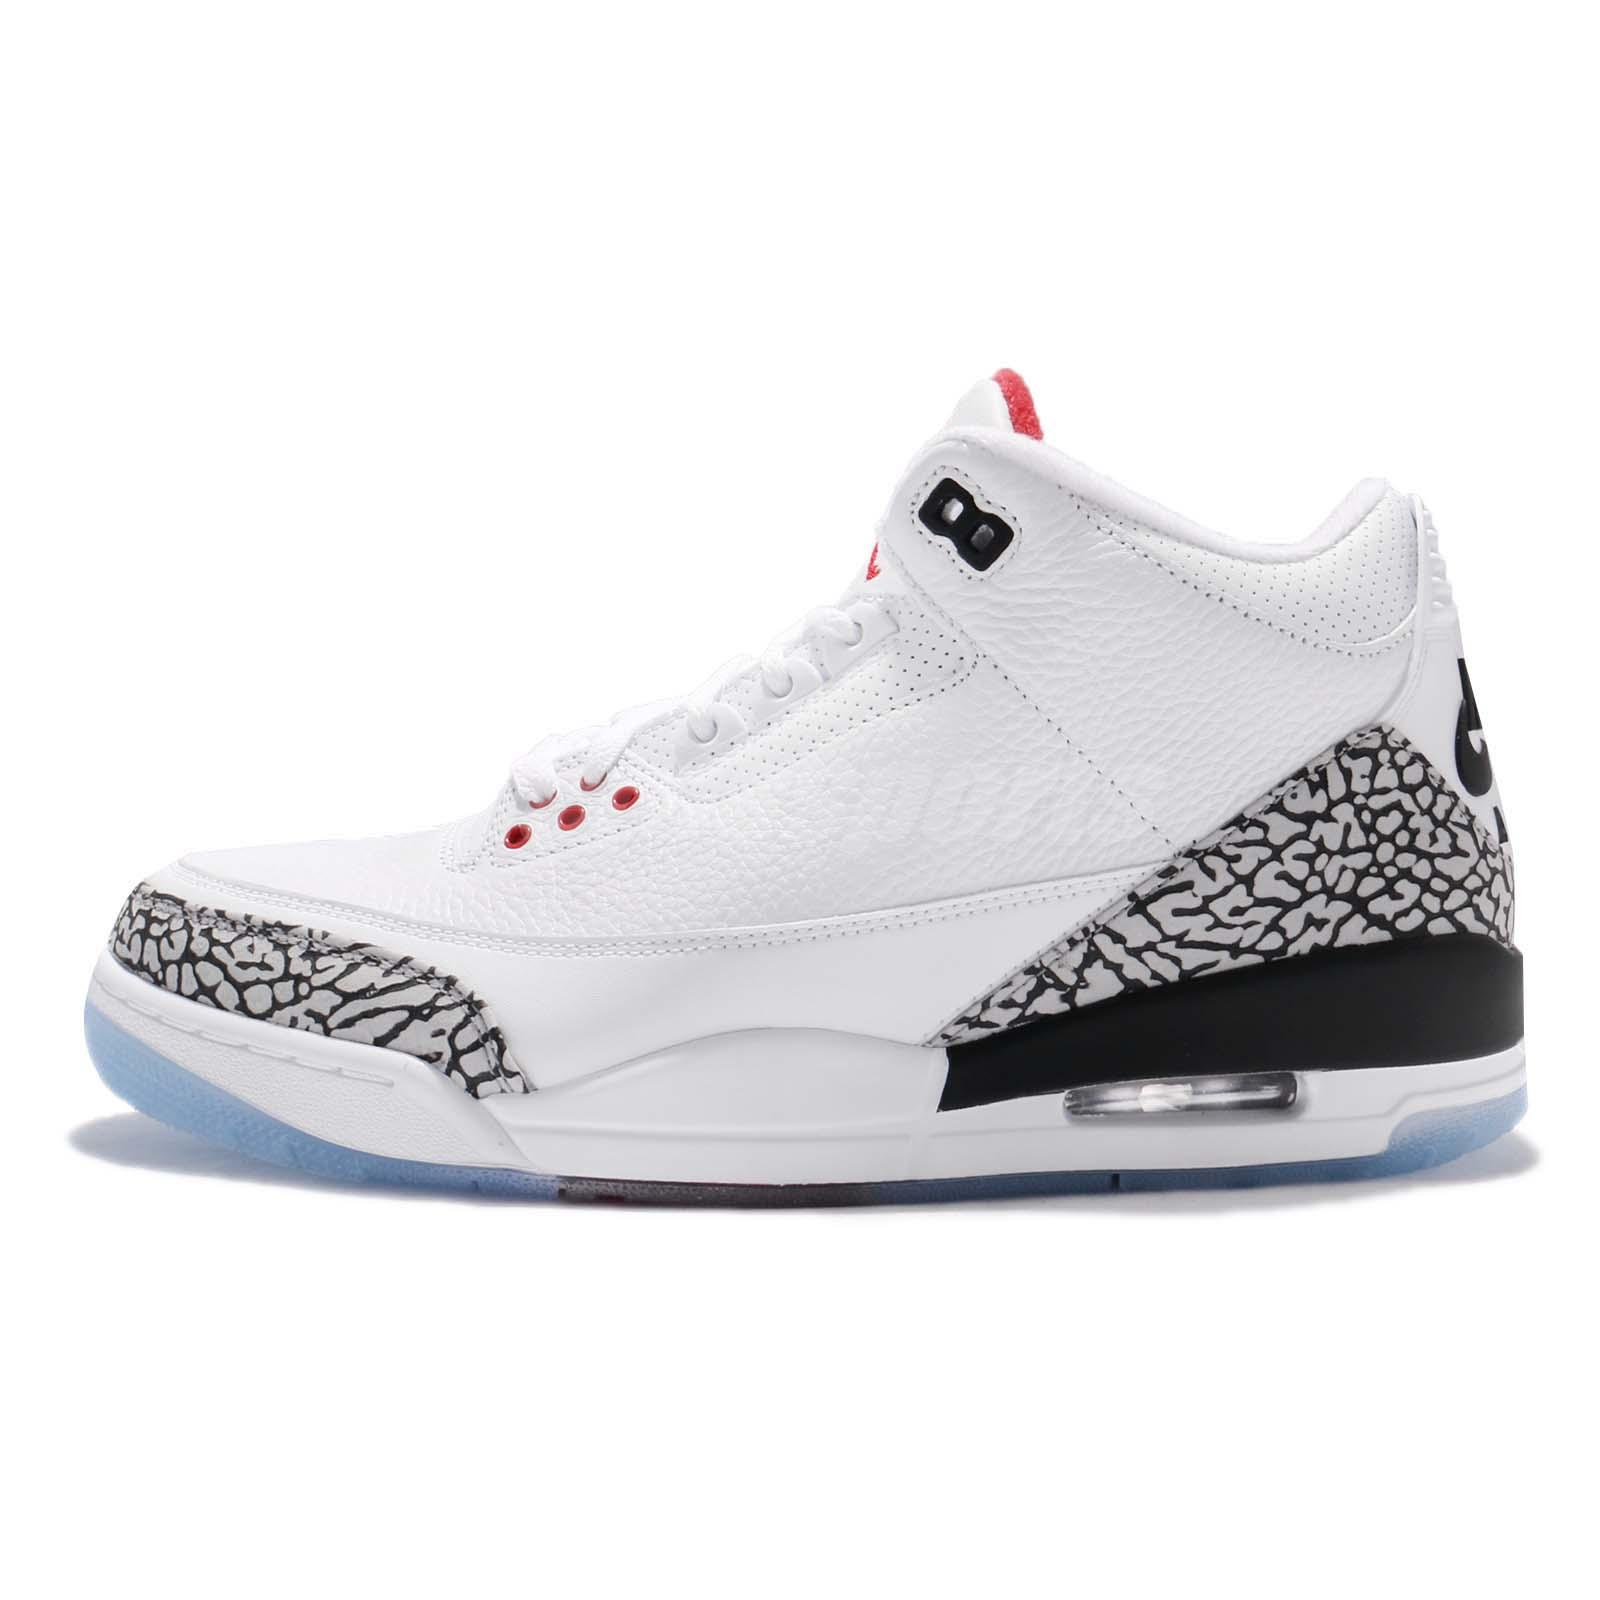 7c0bbf220a9e7 Nike Air Jordan 3 Retro NRG III Free Throw Line Dunk 88 White Cement  923096-101